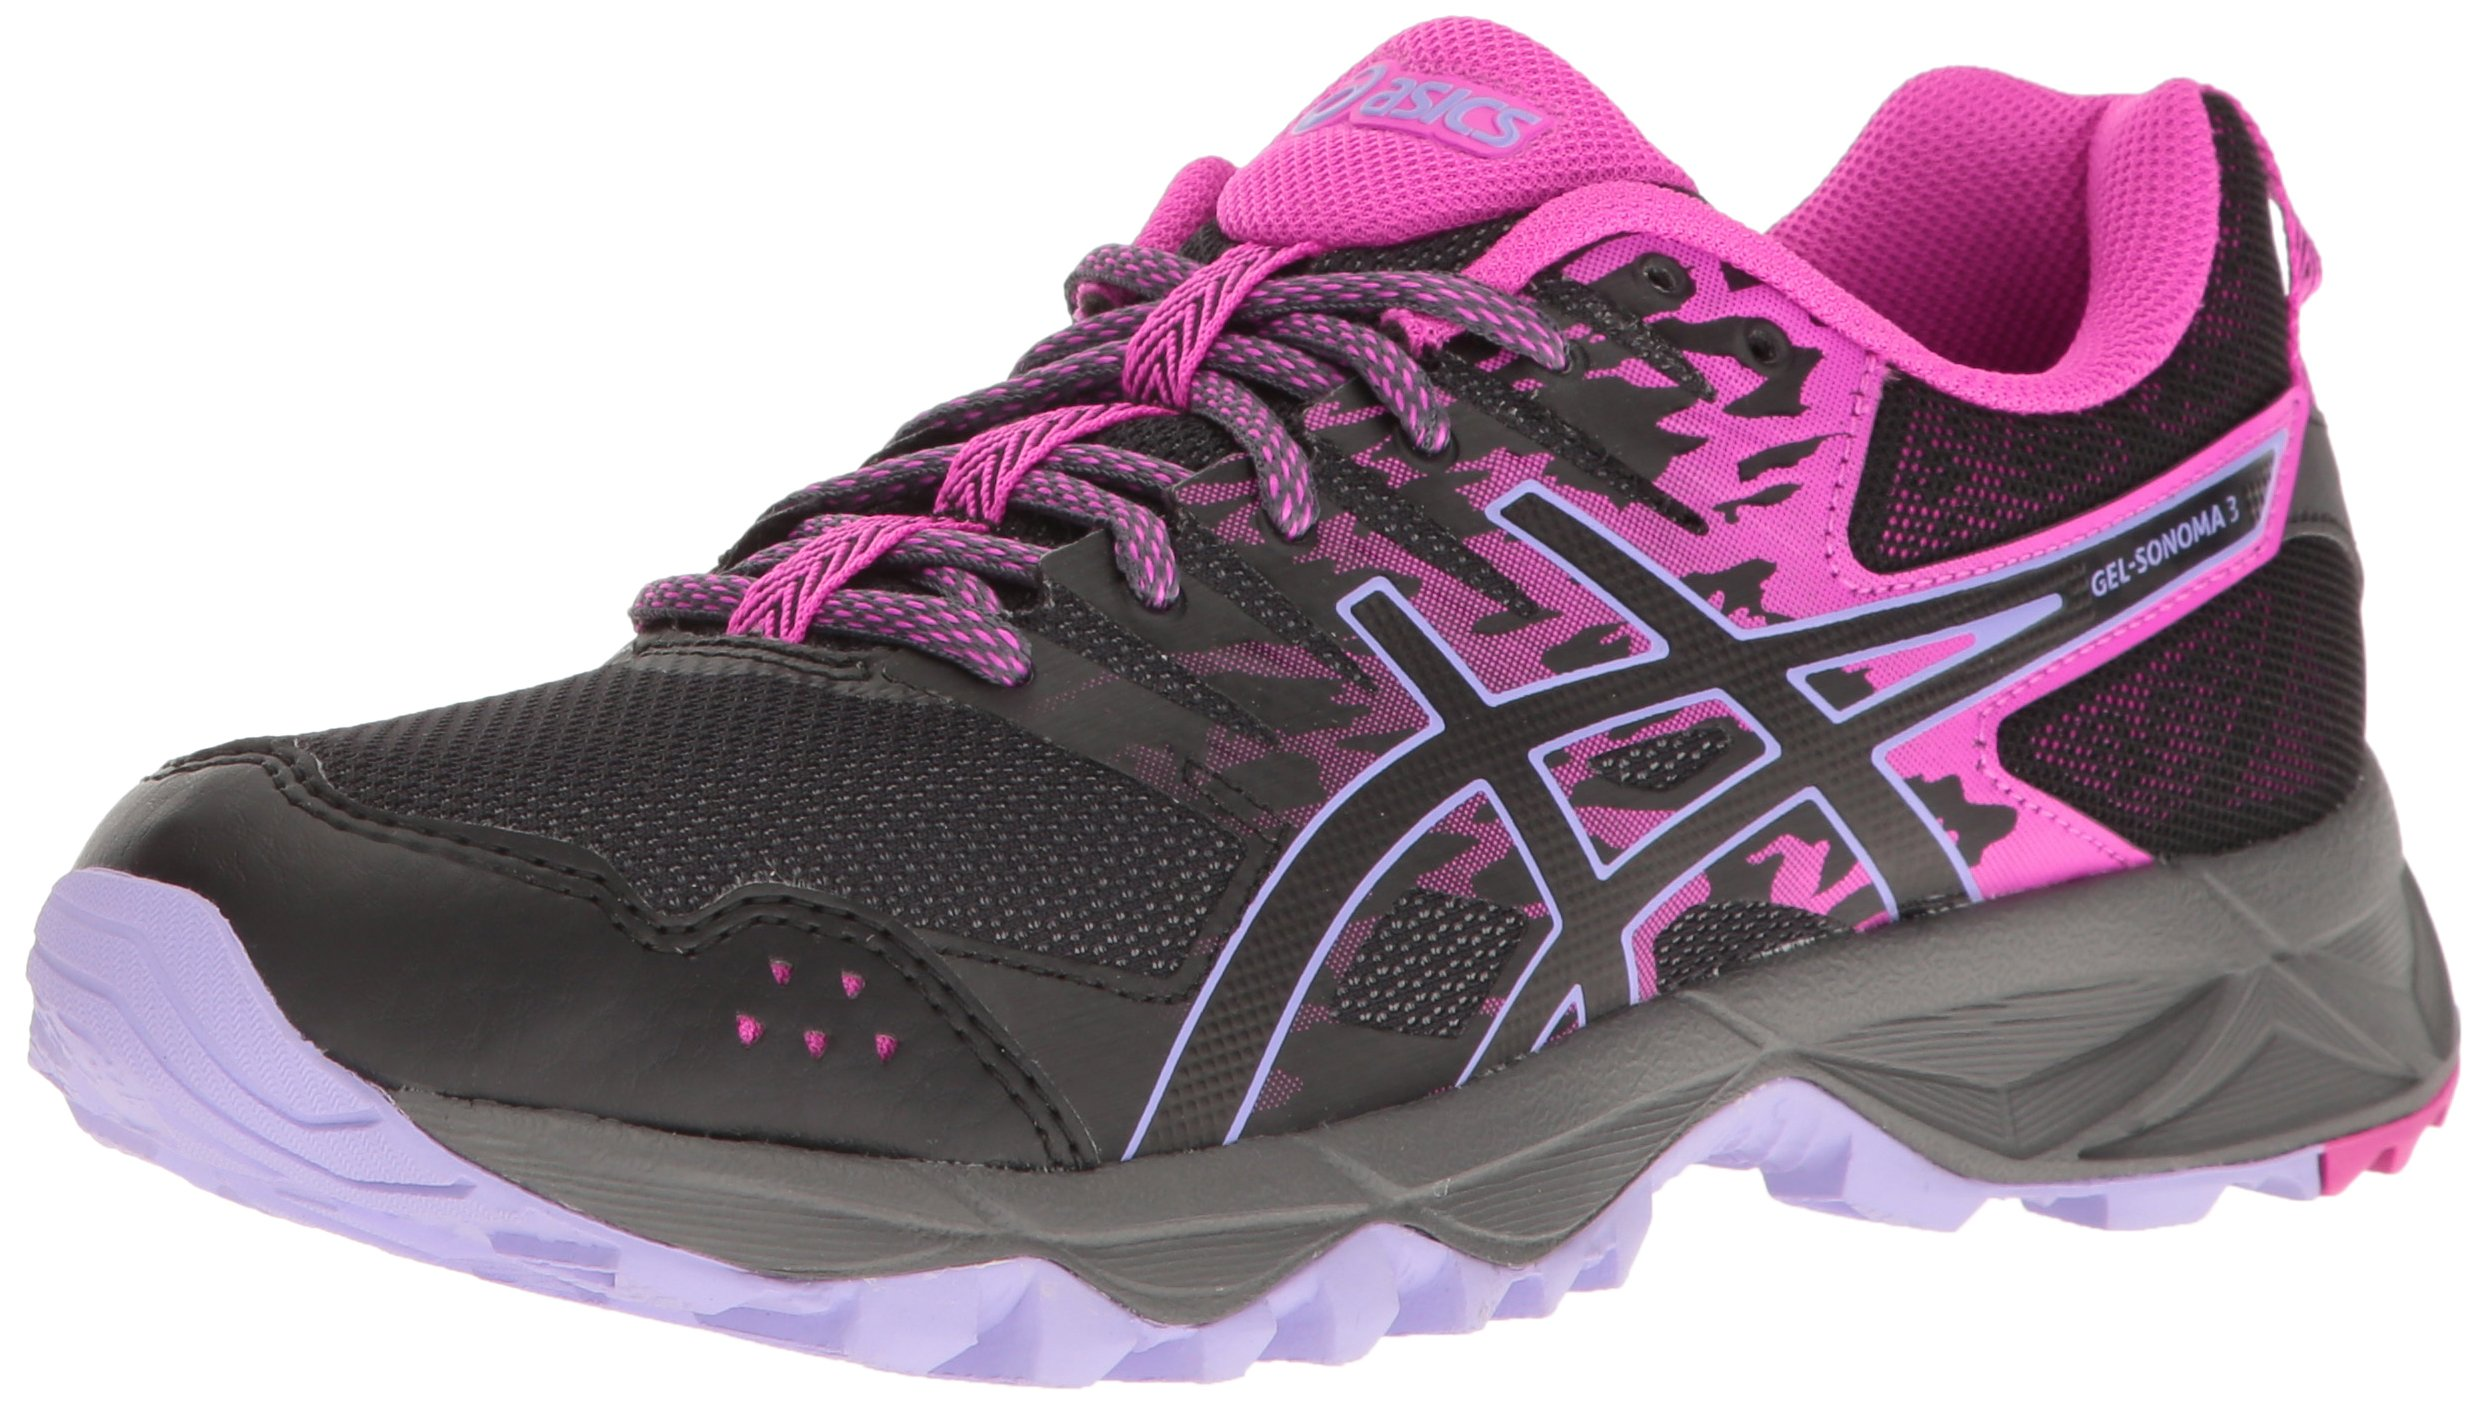 ASICS Women's Gel-Sonoma 3 Trail Runner, Pink Glow/Black/Lavender, 5.5 M US